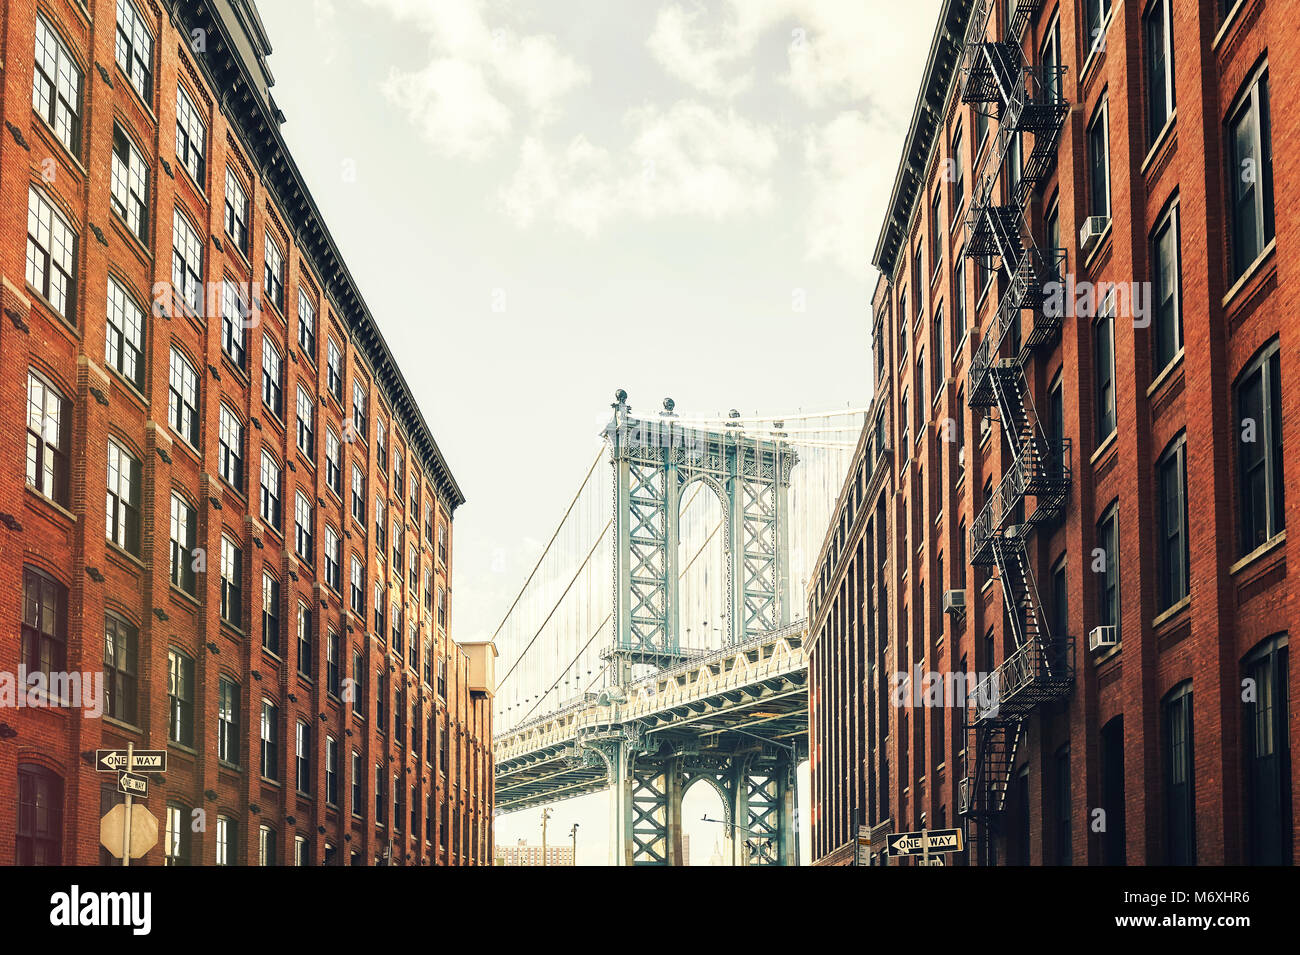 Manhattan Bridge seen from Dumbo, retro toned picture, New York City, USA. - Stock Image